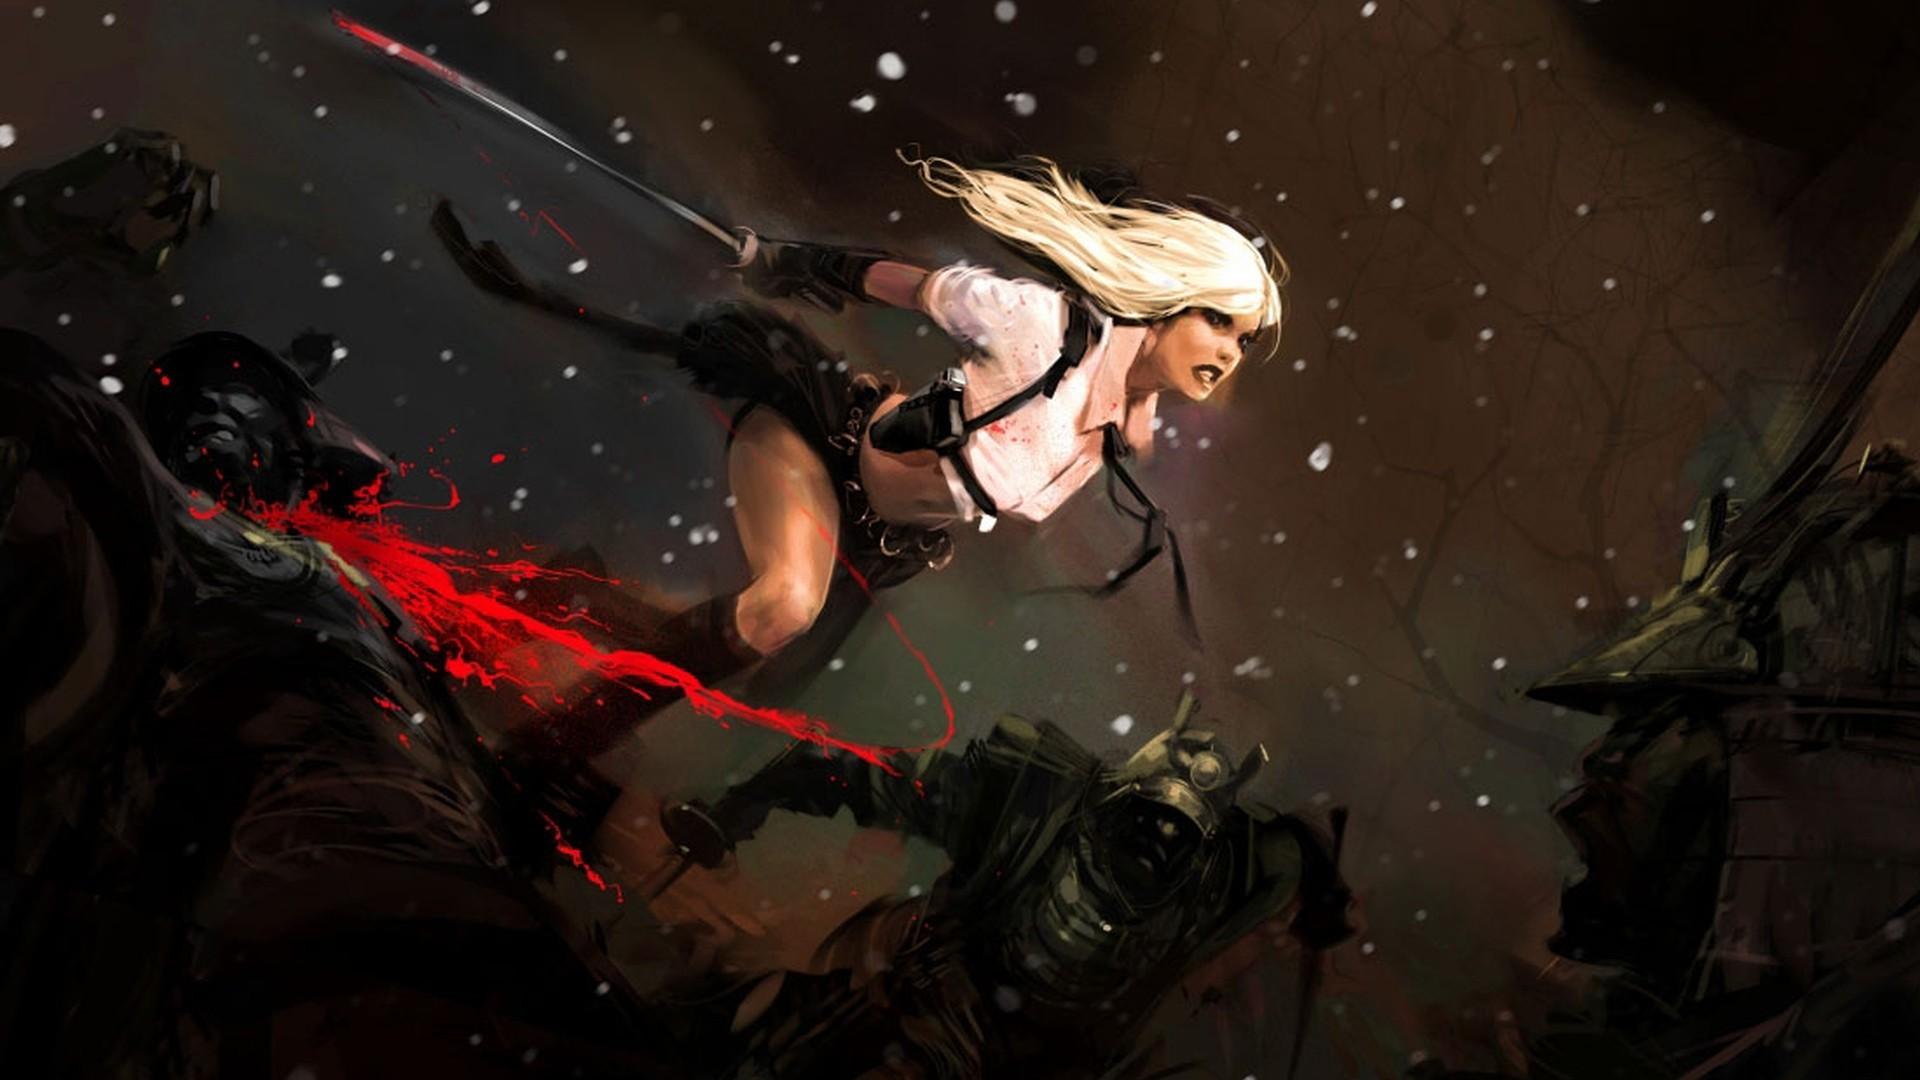 Fantasy – Samurai Bakgrund